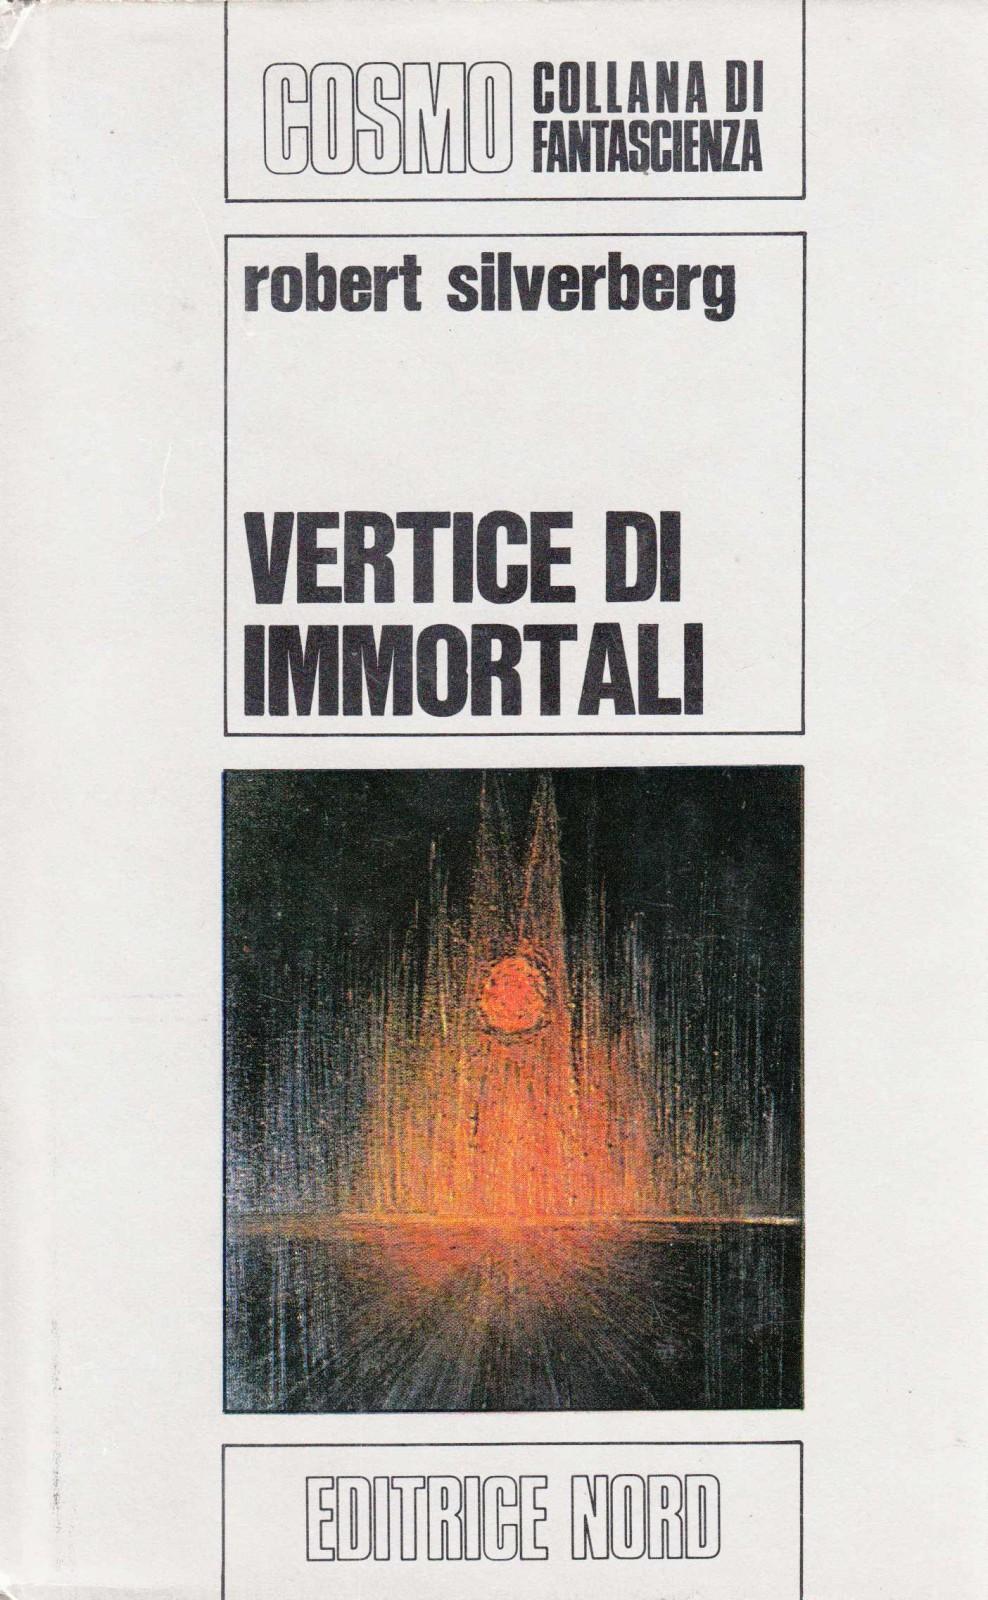 Robert Silverberg - Vertice d'immortali (1971)